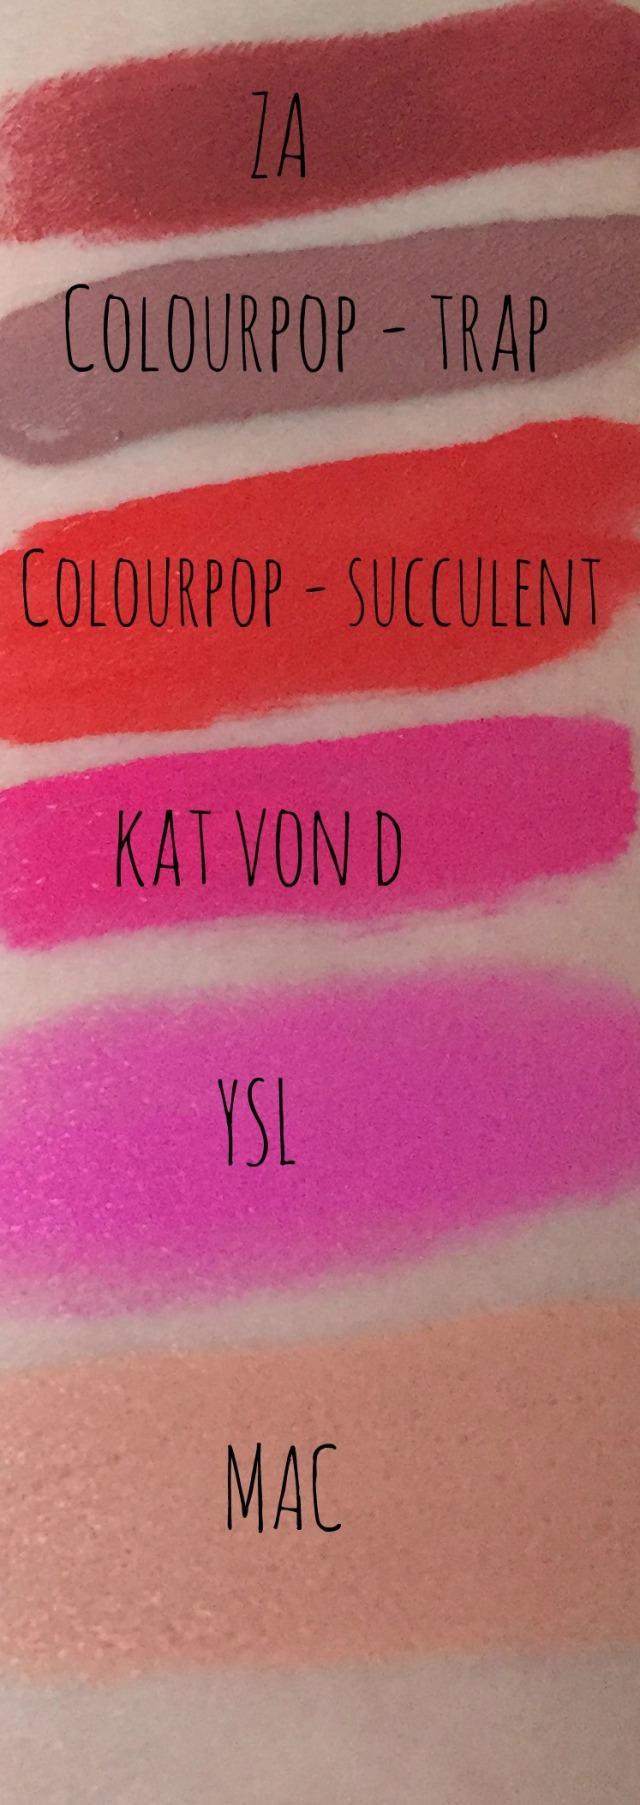 Swatch Lipsticks I use Everyday Colourpop Ultra Matte YSL Rouge Pur Couture Mac Kat Von D